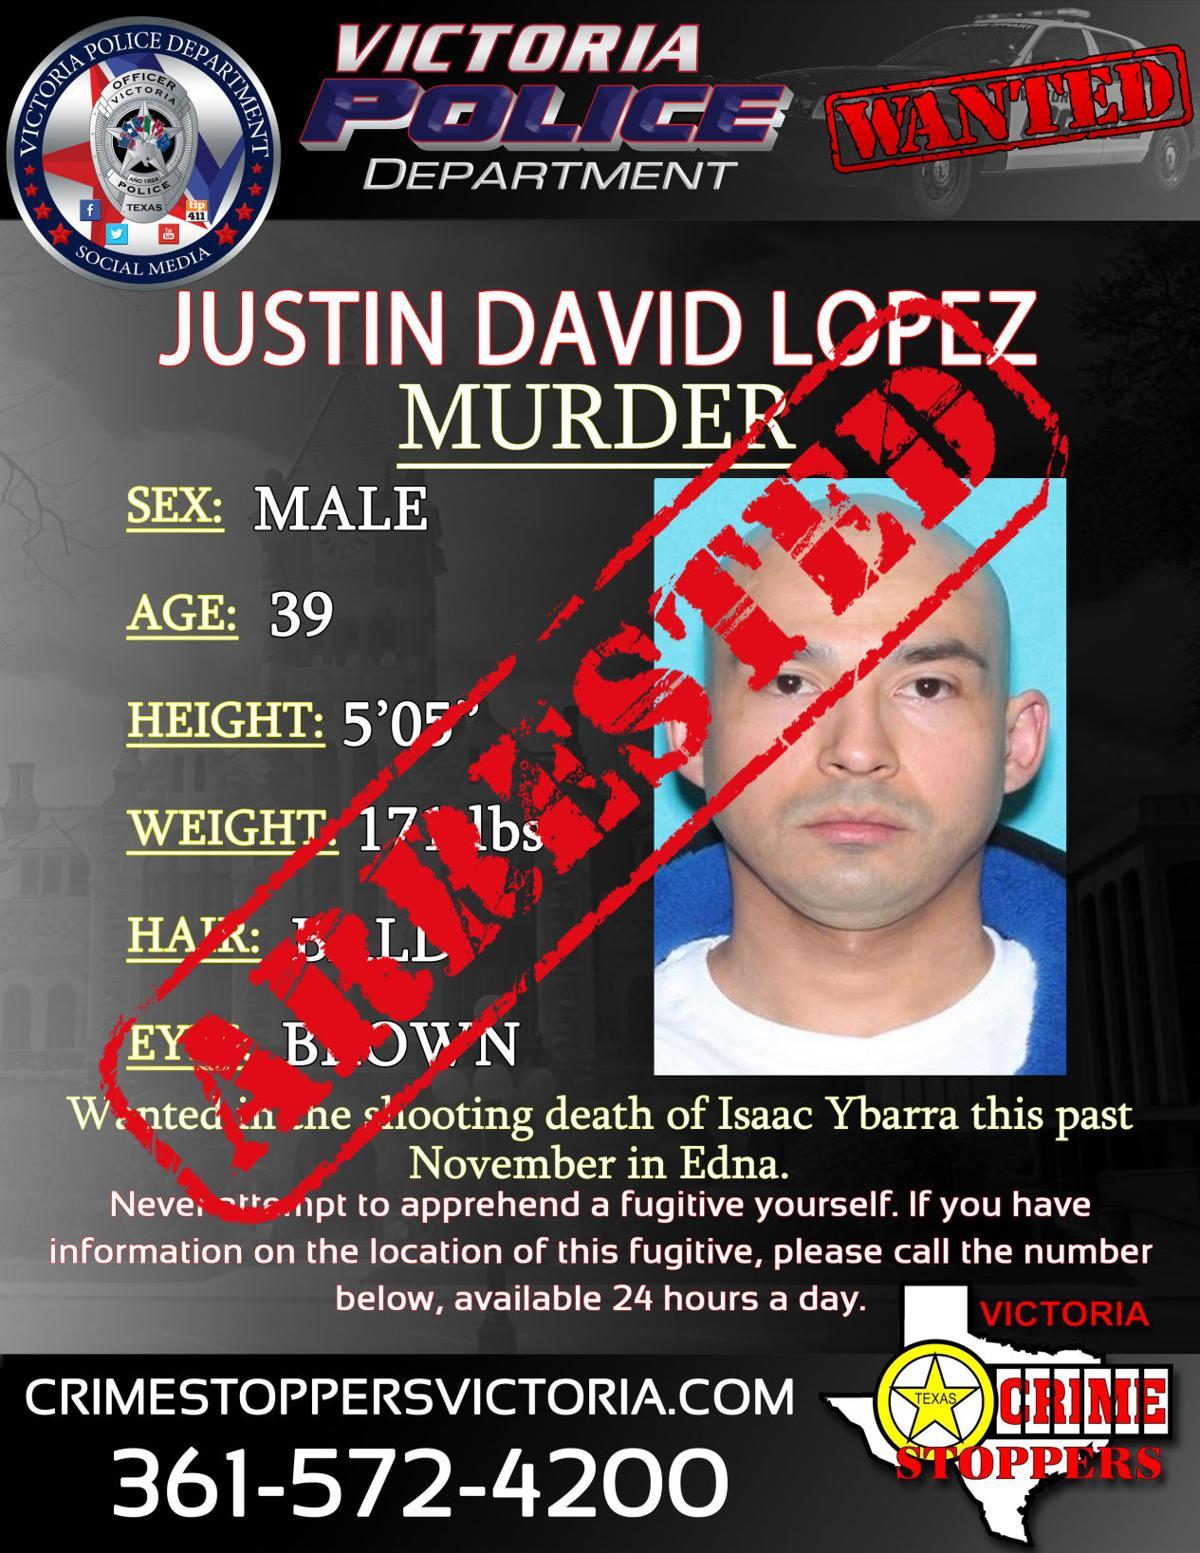 Justin David Lopez